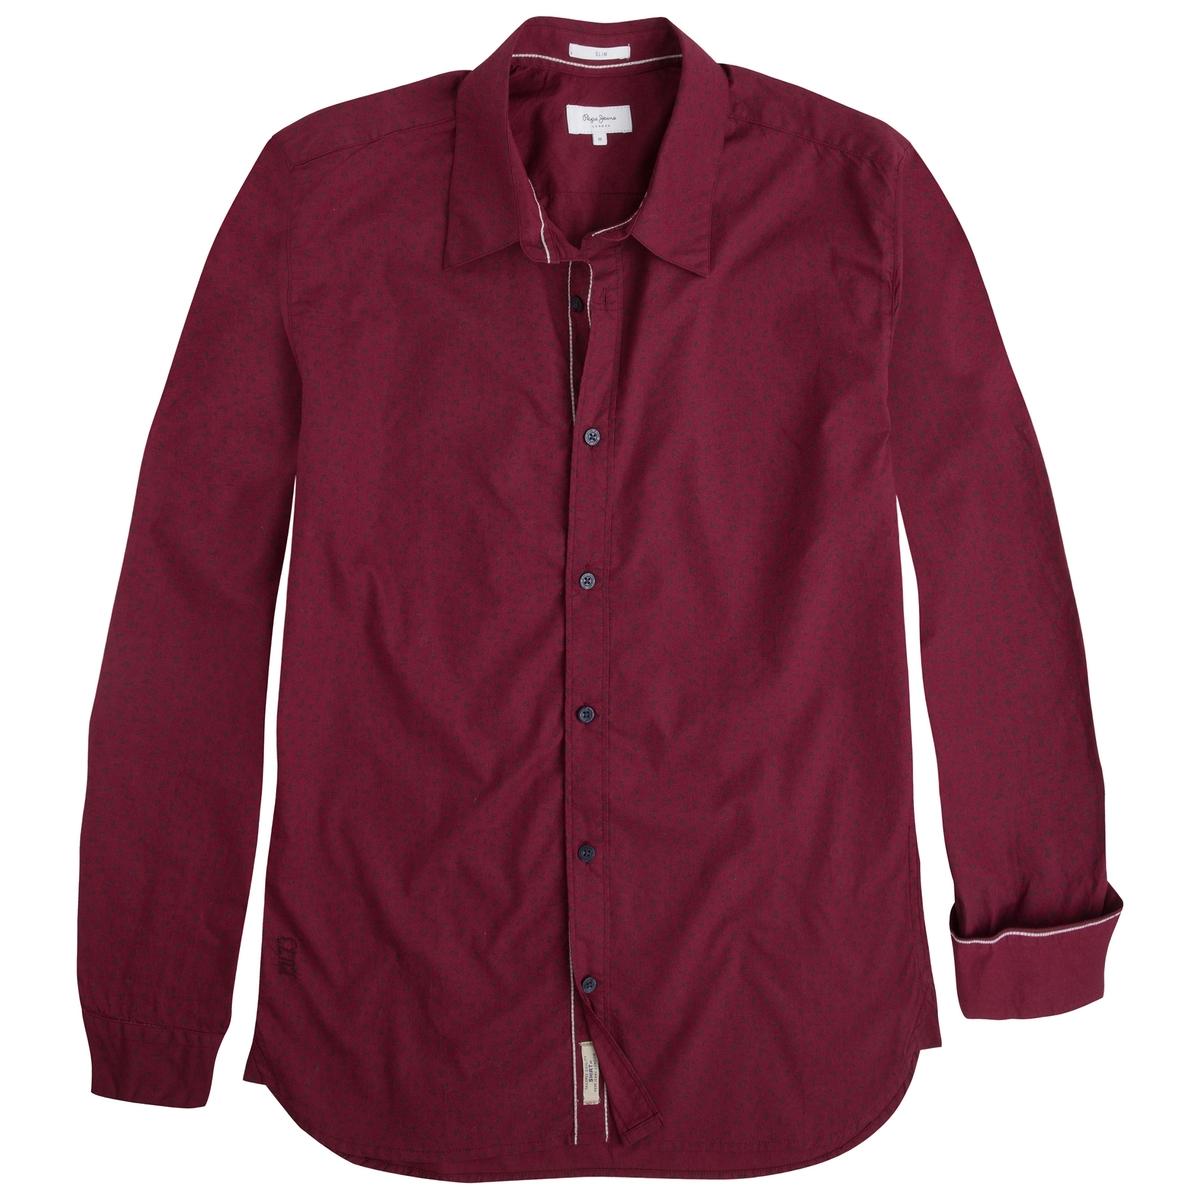 Рубашка с рисункомСостав и описаниеМатериал : 100% хлопкаМарка : PEPE JEANS<br><br>Цвет: бордовый<br>Размер: S